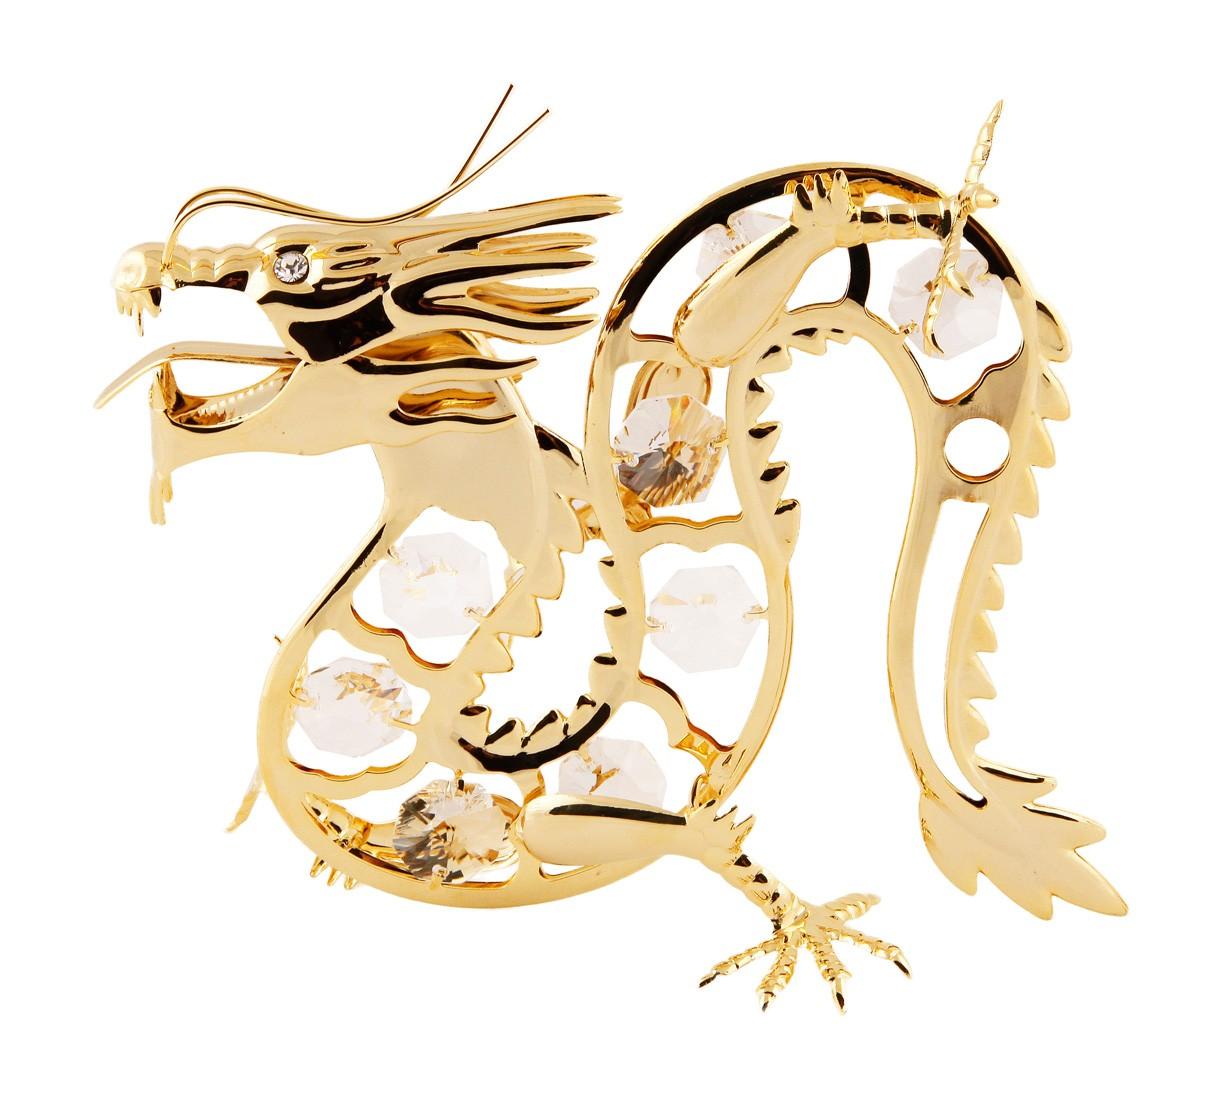 Dragon Norocos cu Cristale Swarovski - placat cu Aur 24K